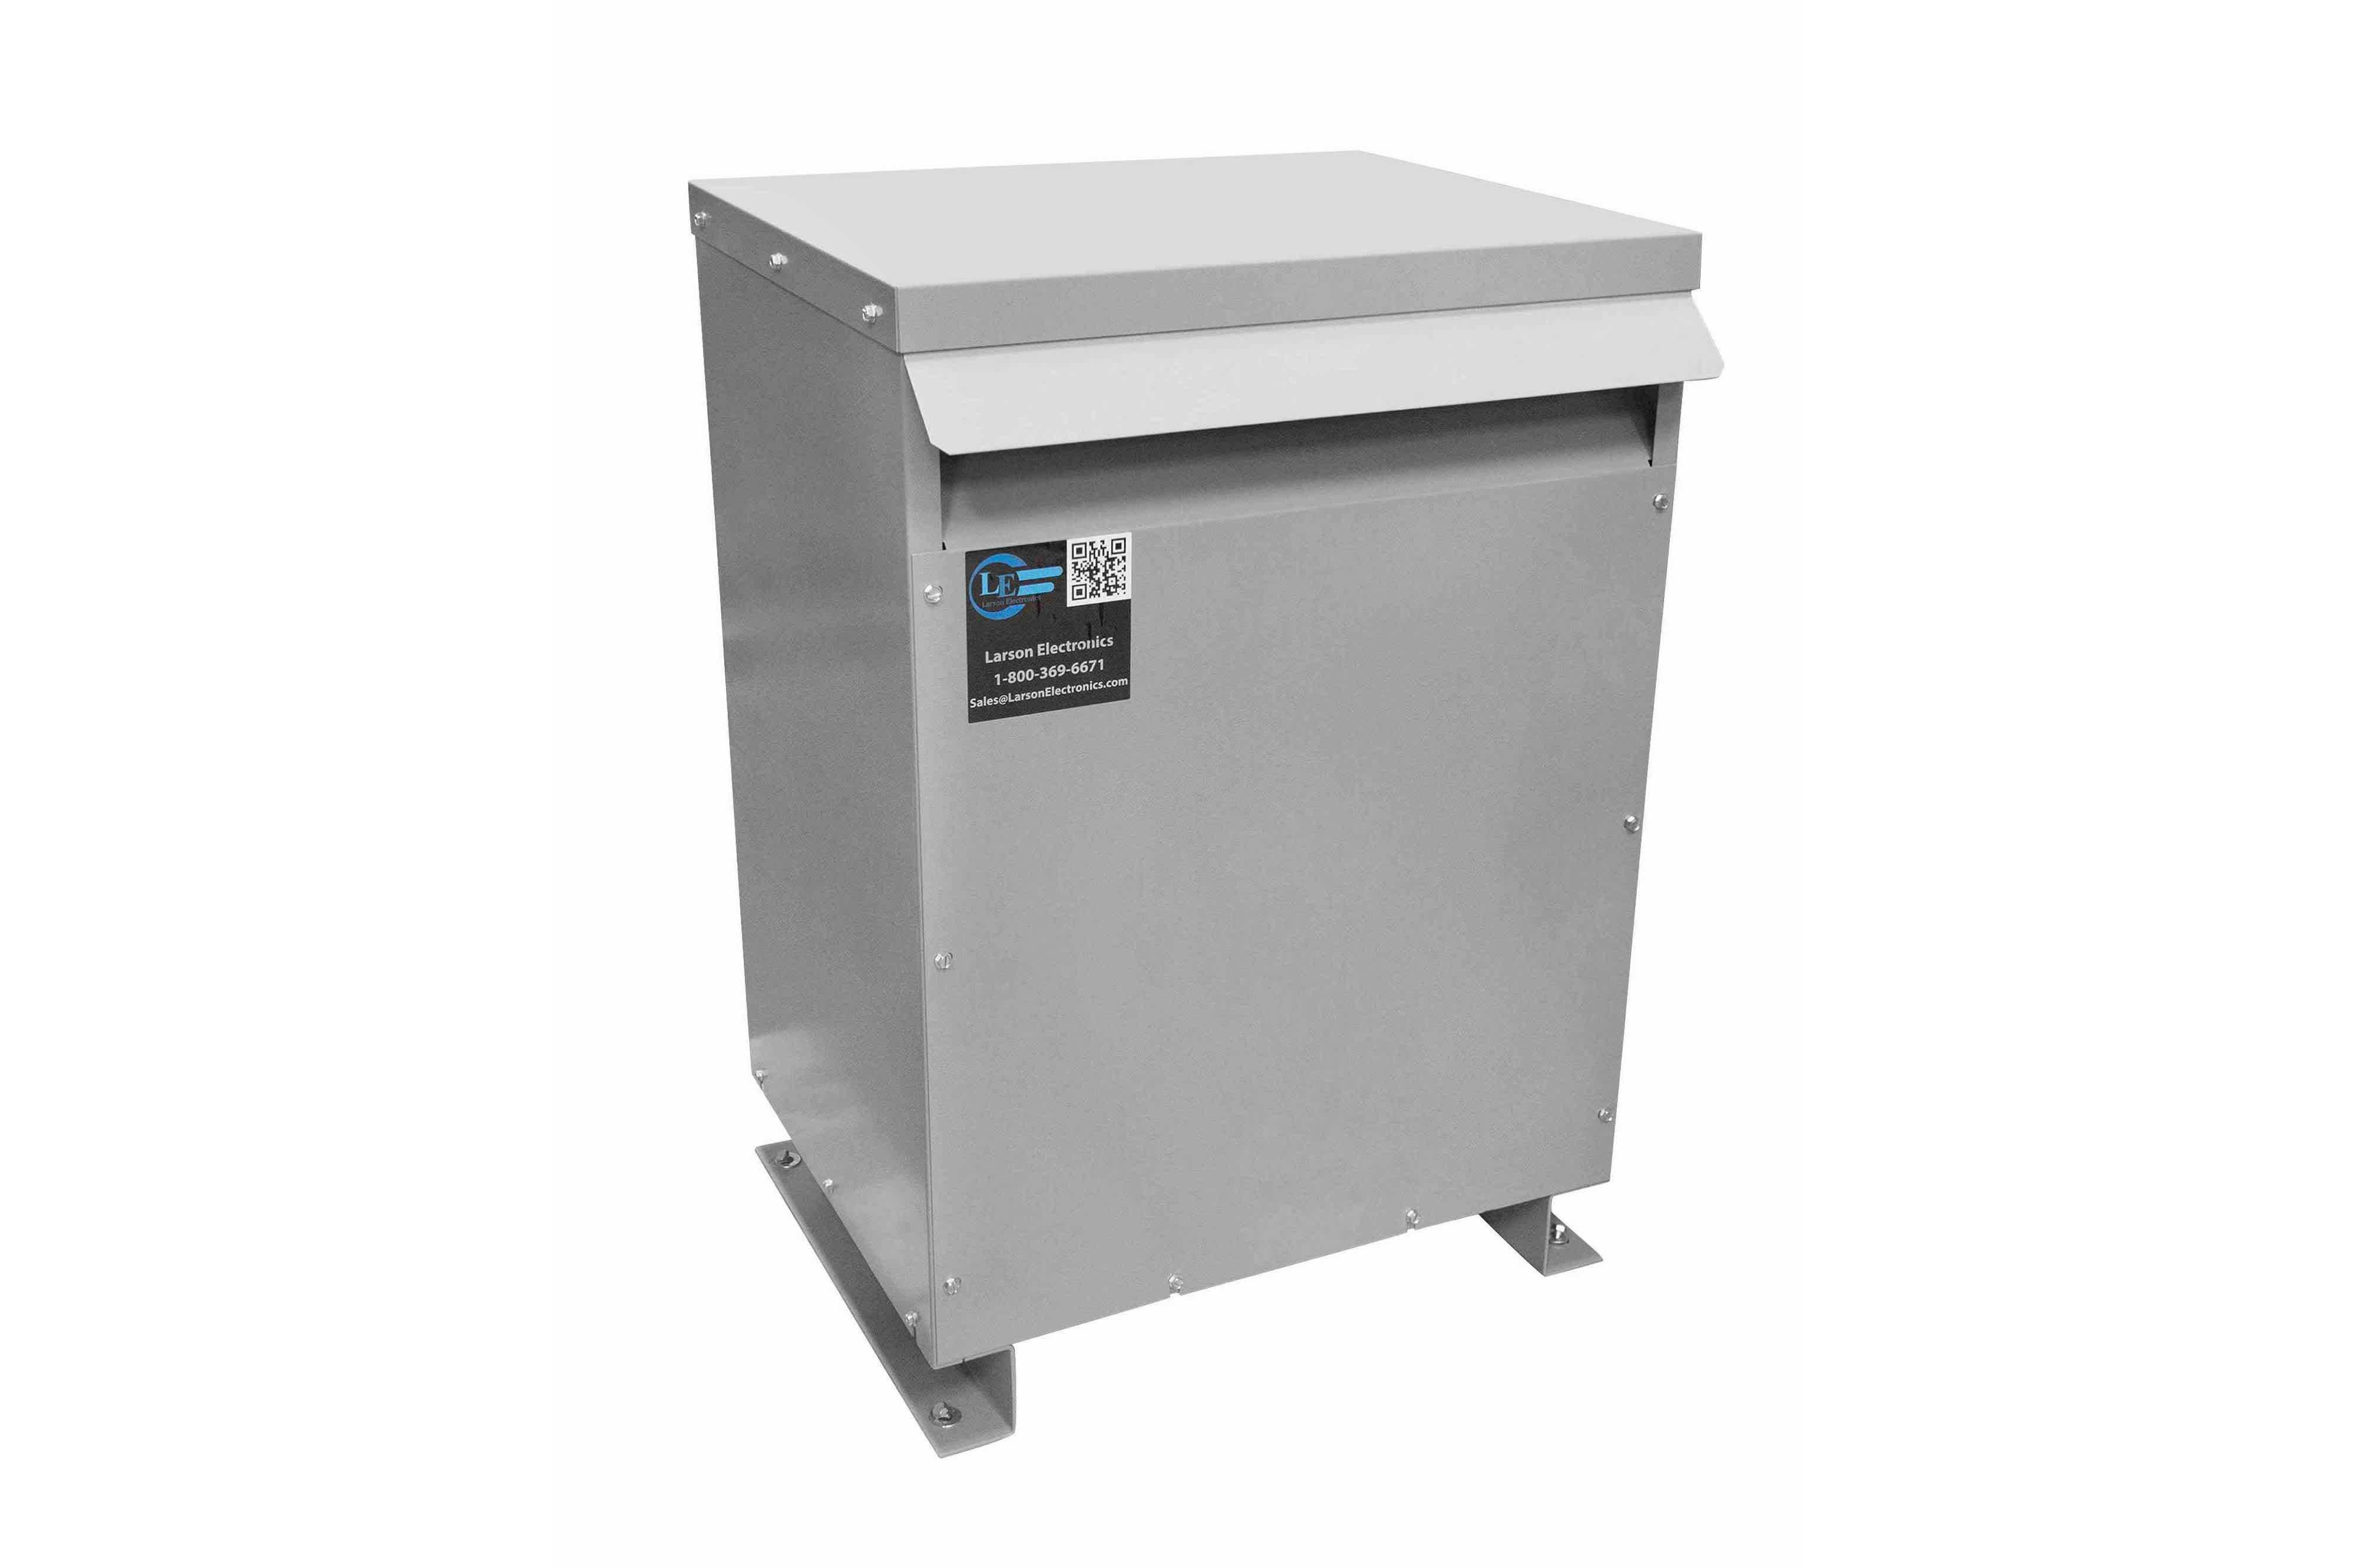 115 kVA 3PH Isolation Transformer, 460V Wye Primary, 415V Delta Secondary, N3R, Ventilated, 60 Hz